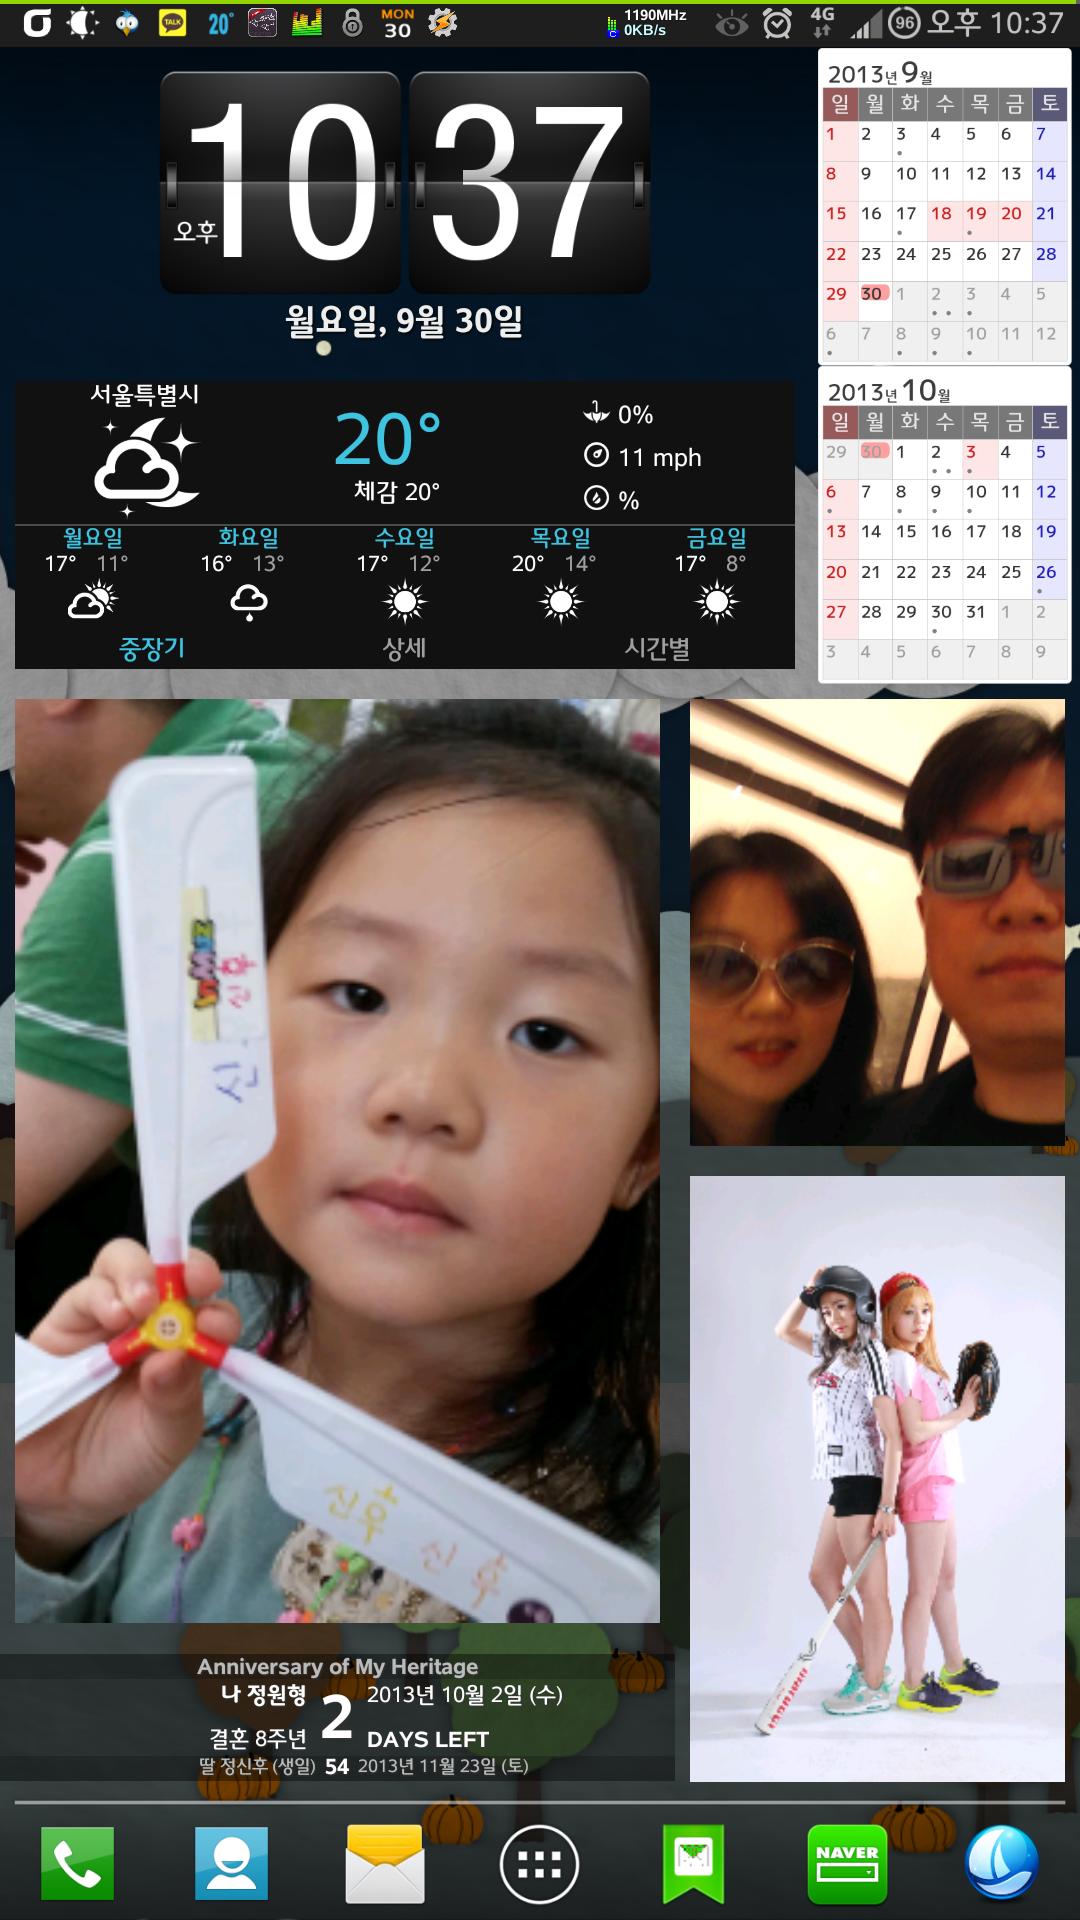 Screenshot_2013-09-30-22-37-05.png